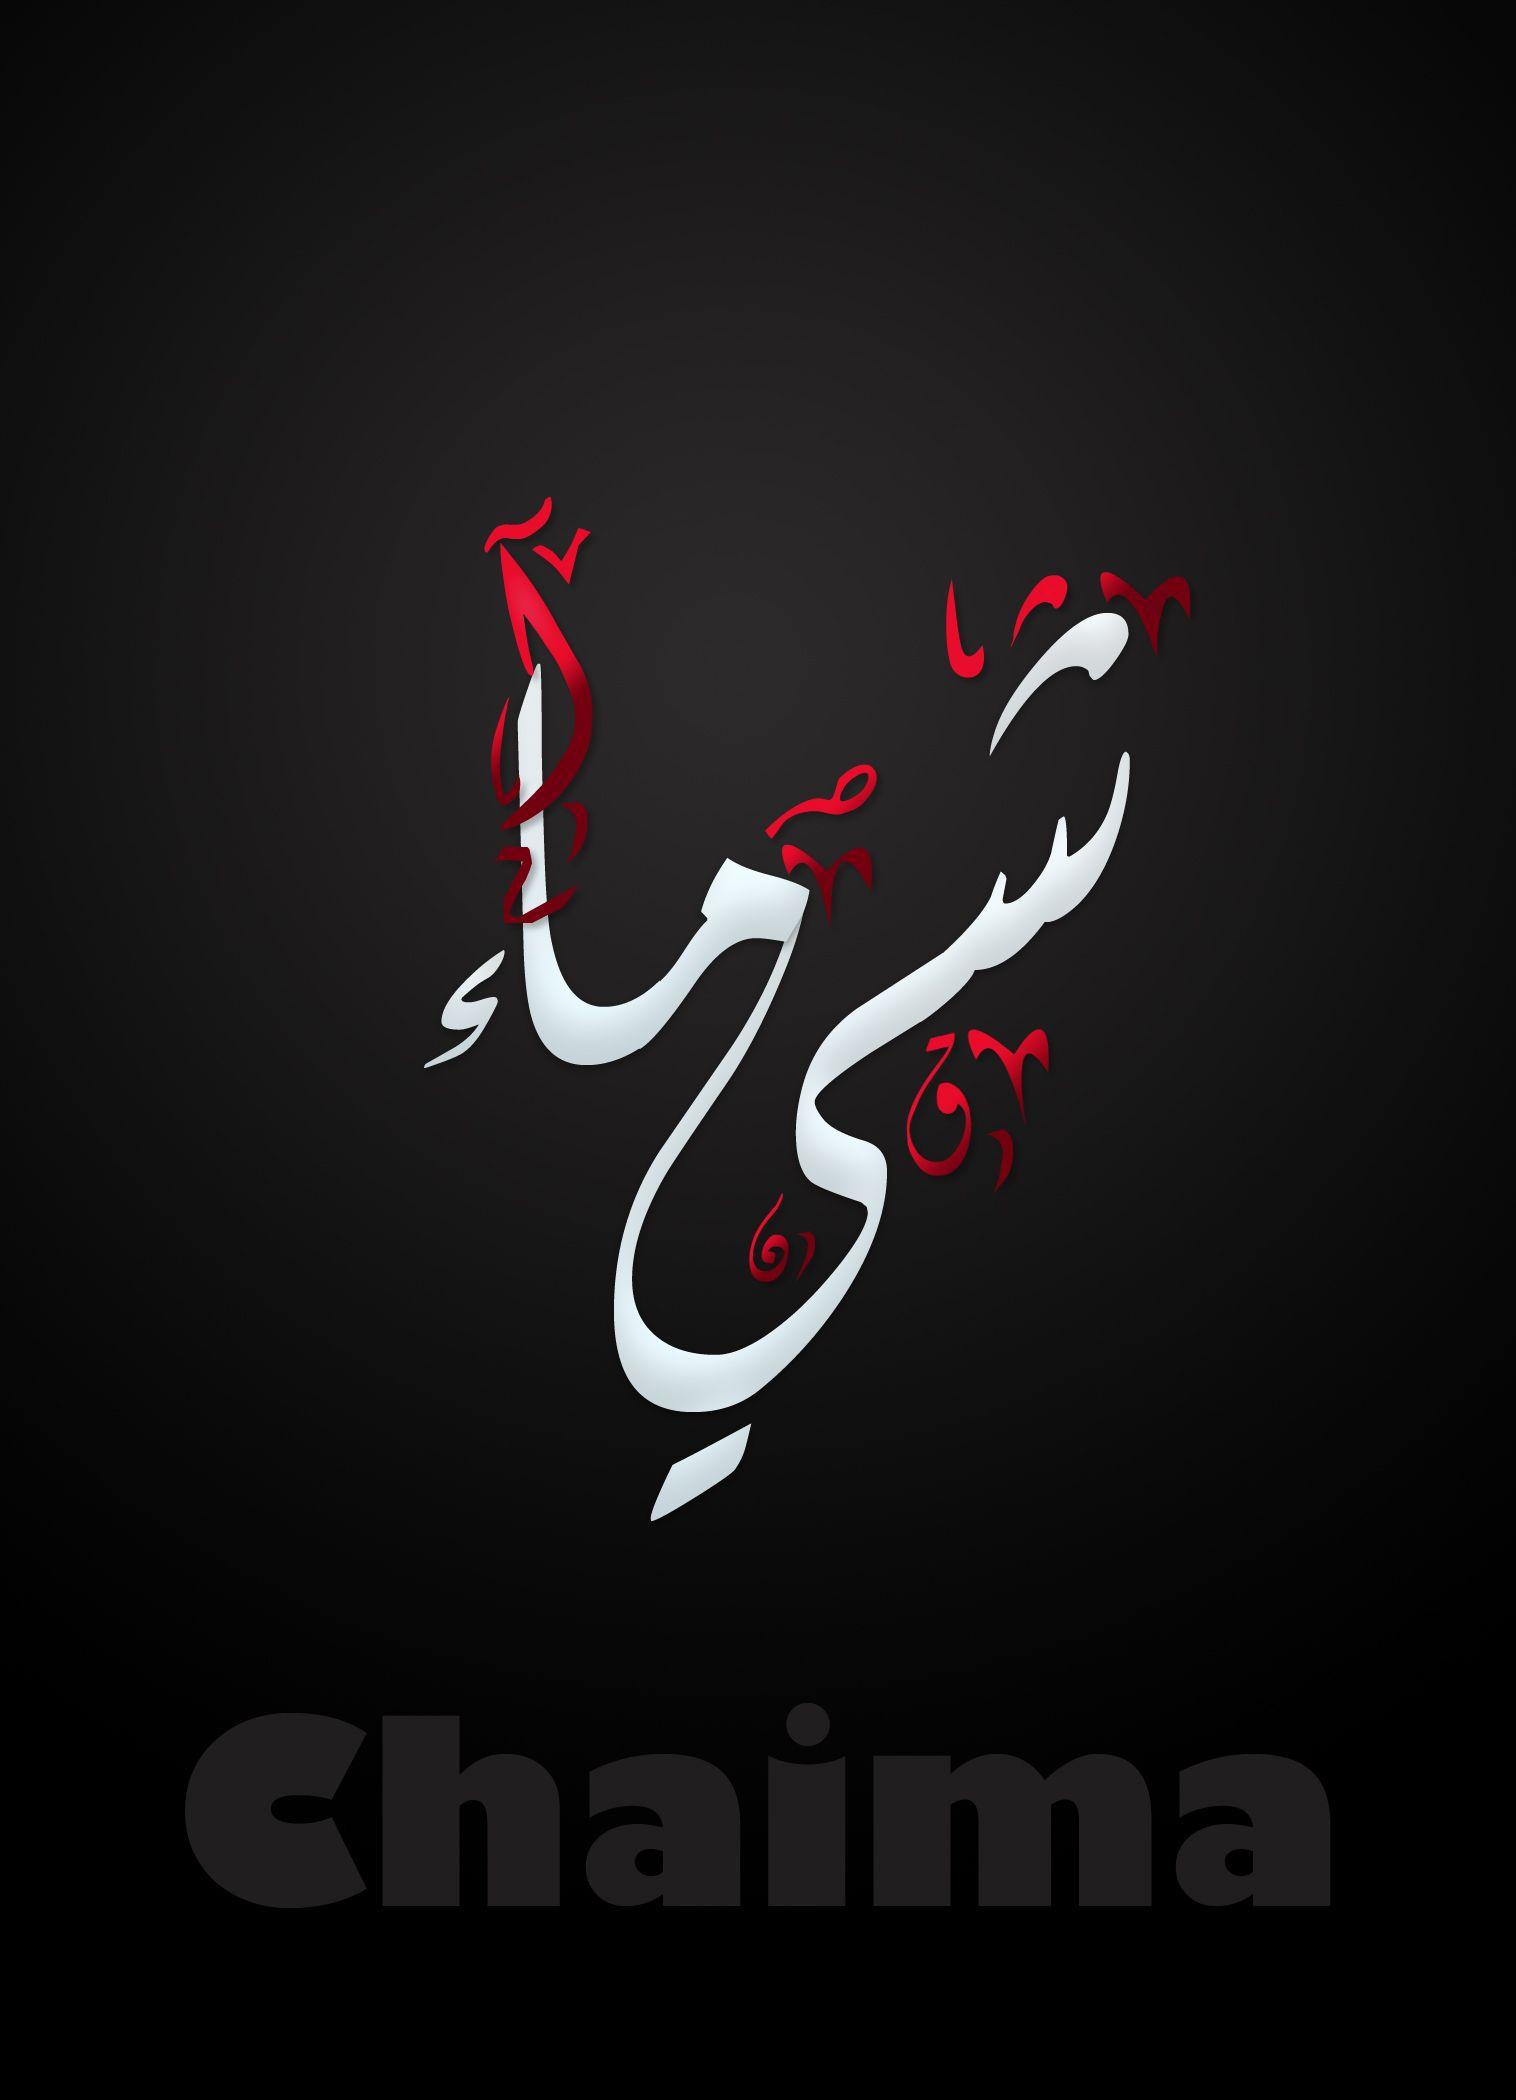 Chaima شيماء Islamic Art Calligraphy Calligraphy Name Calligraphy